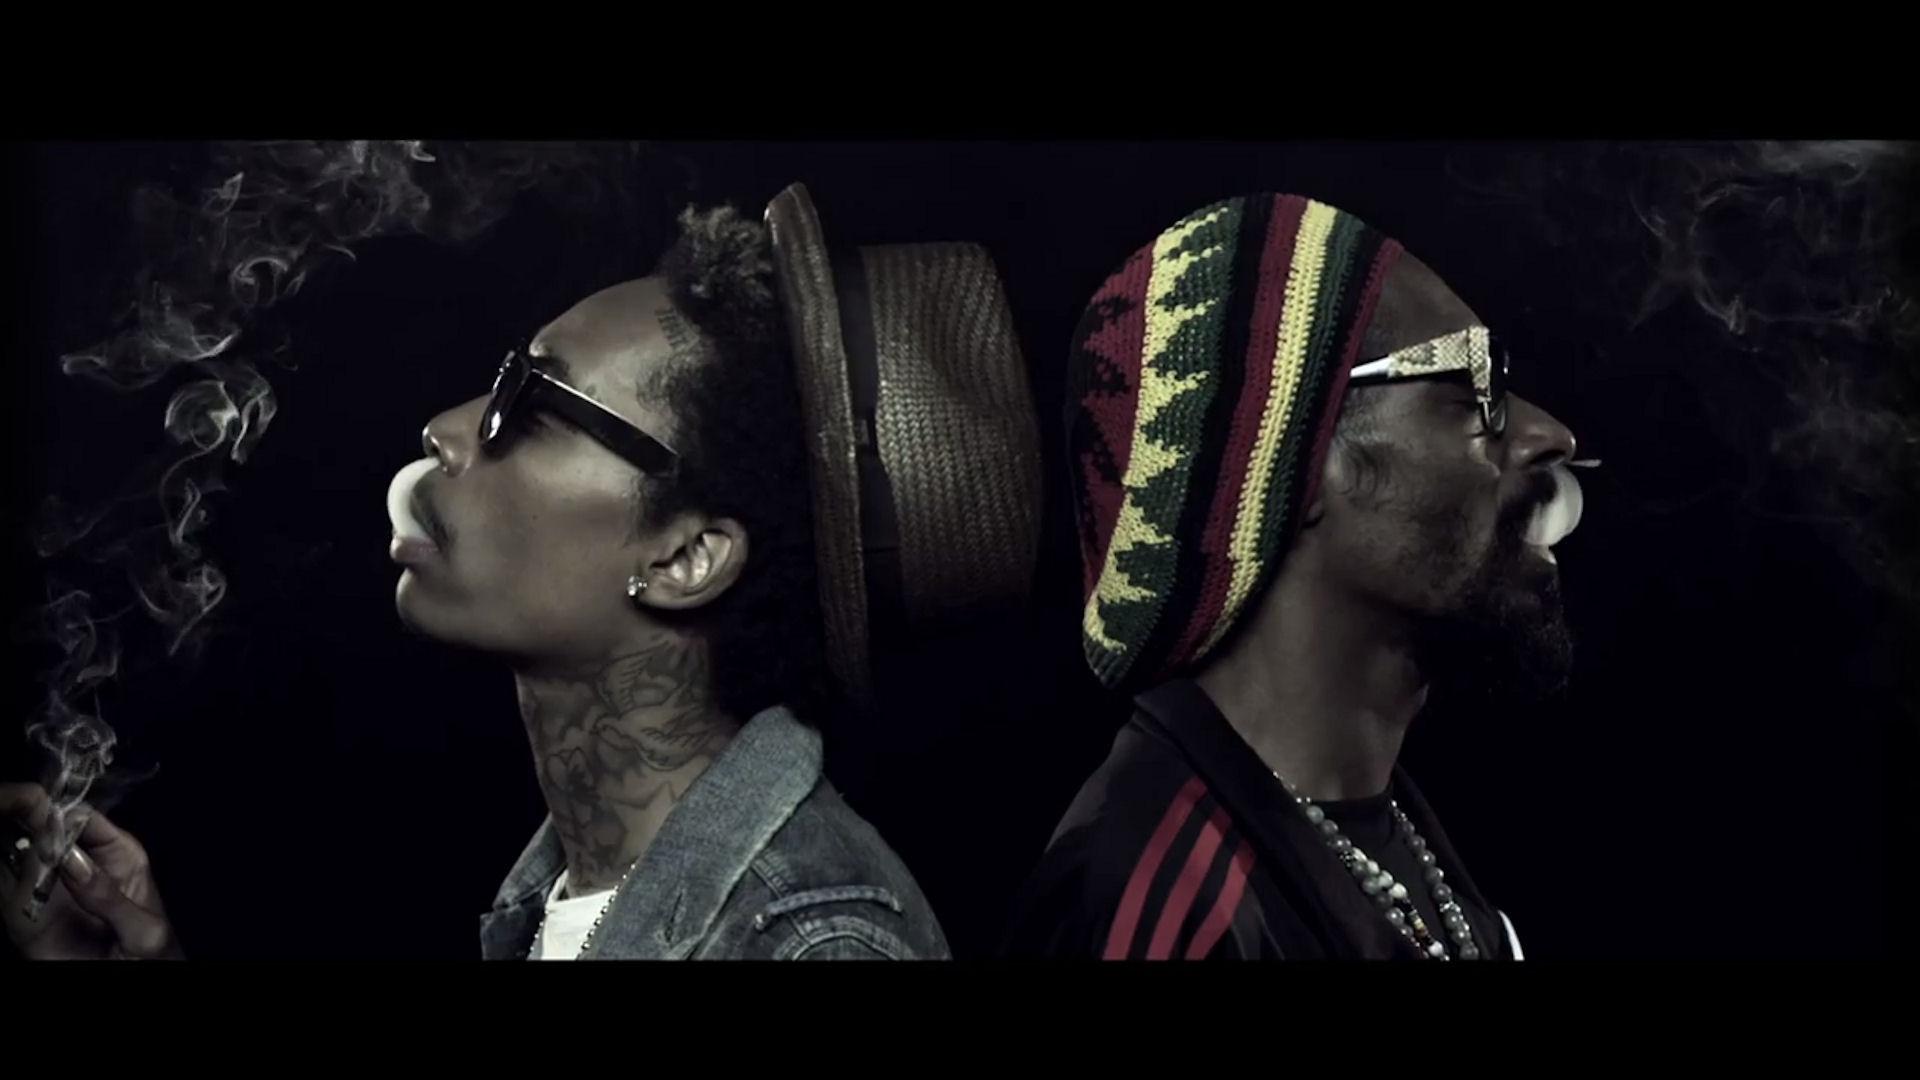 Wiz Khalifa and Snoop Dogg Smoking Rap Wallpapers 1920x1080